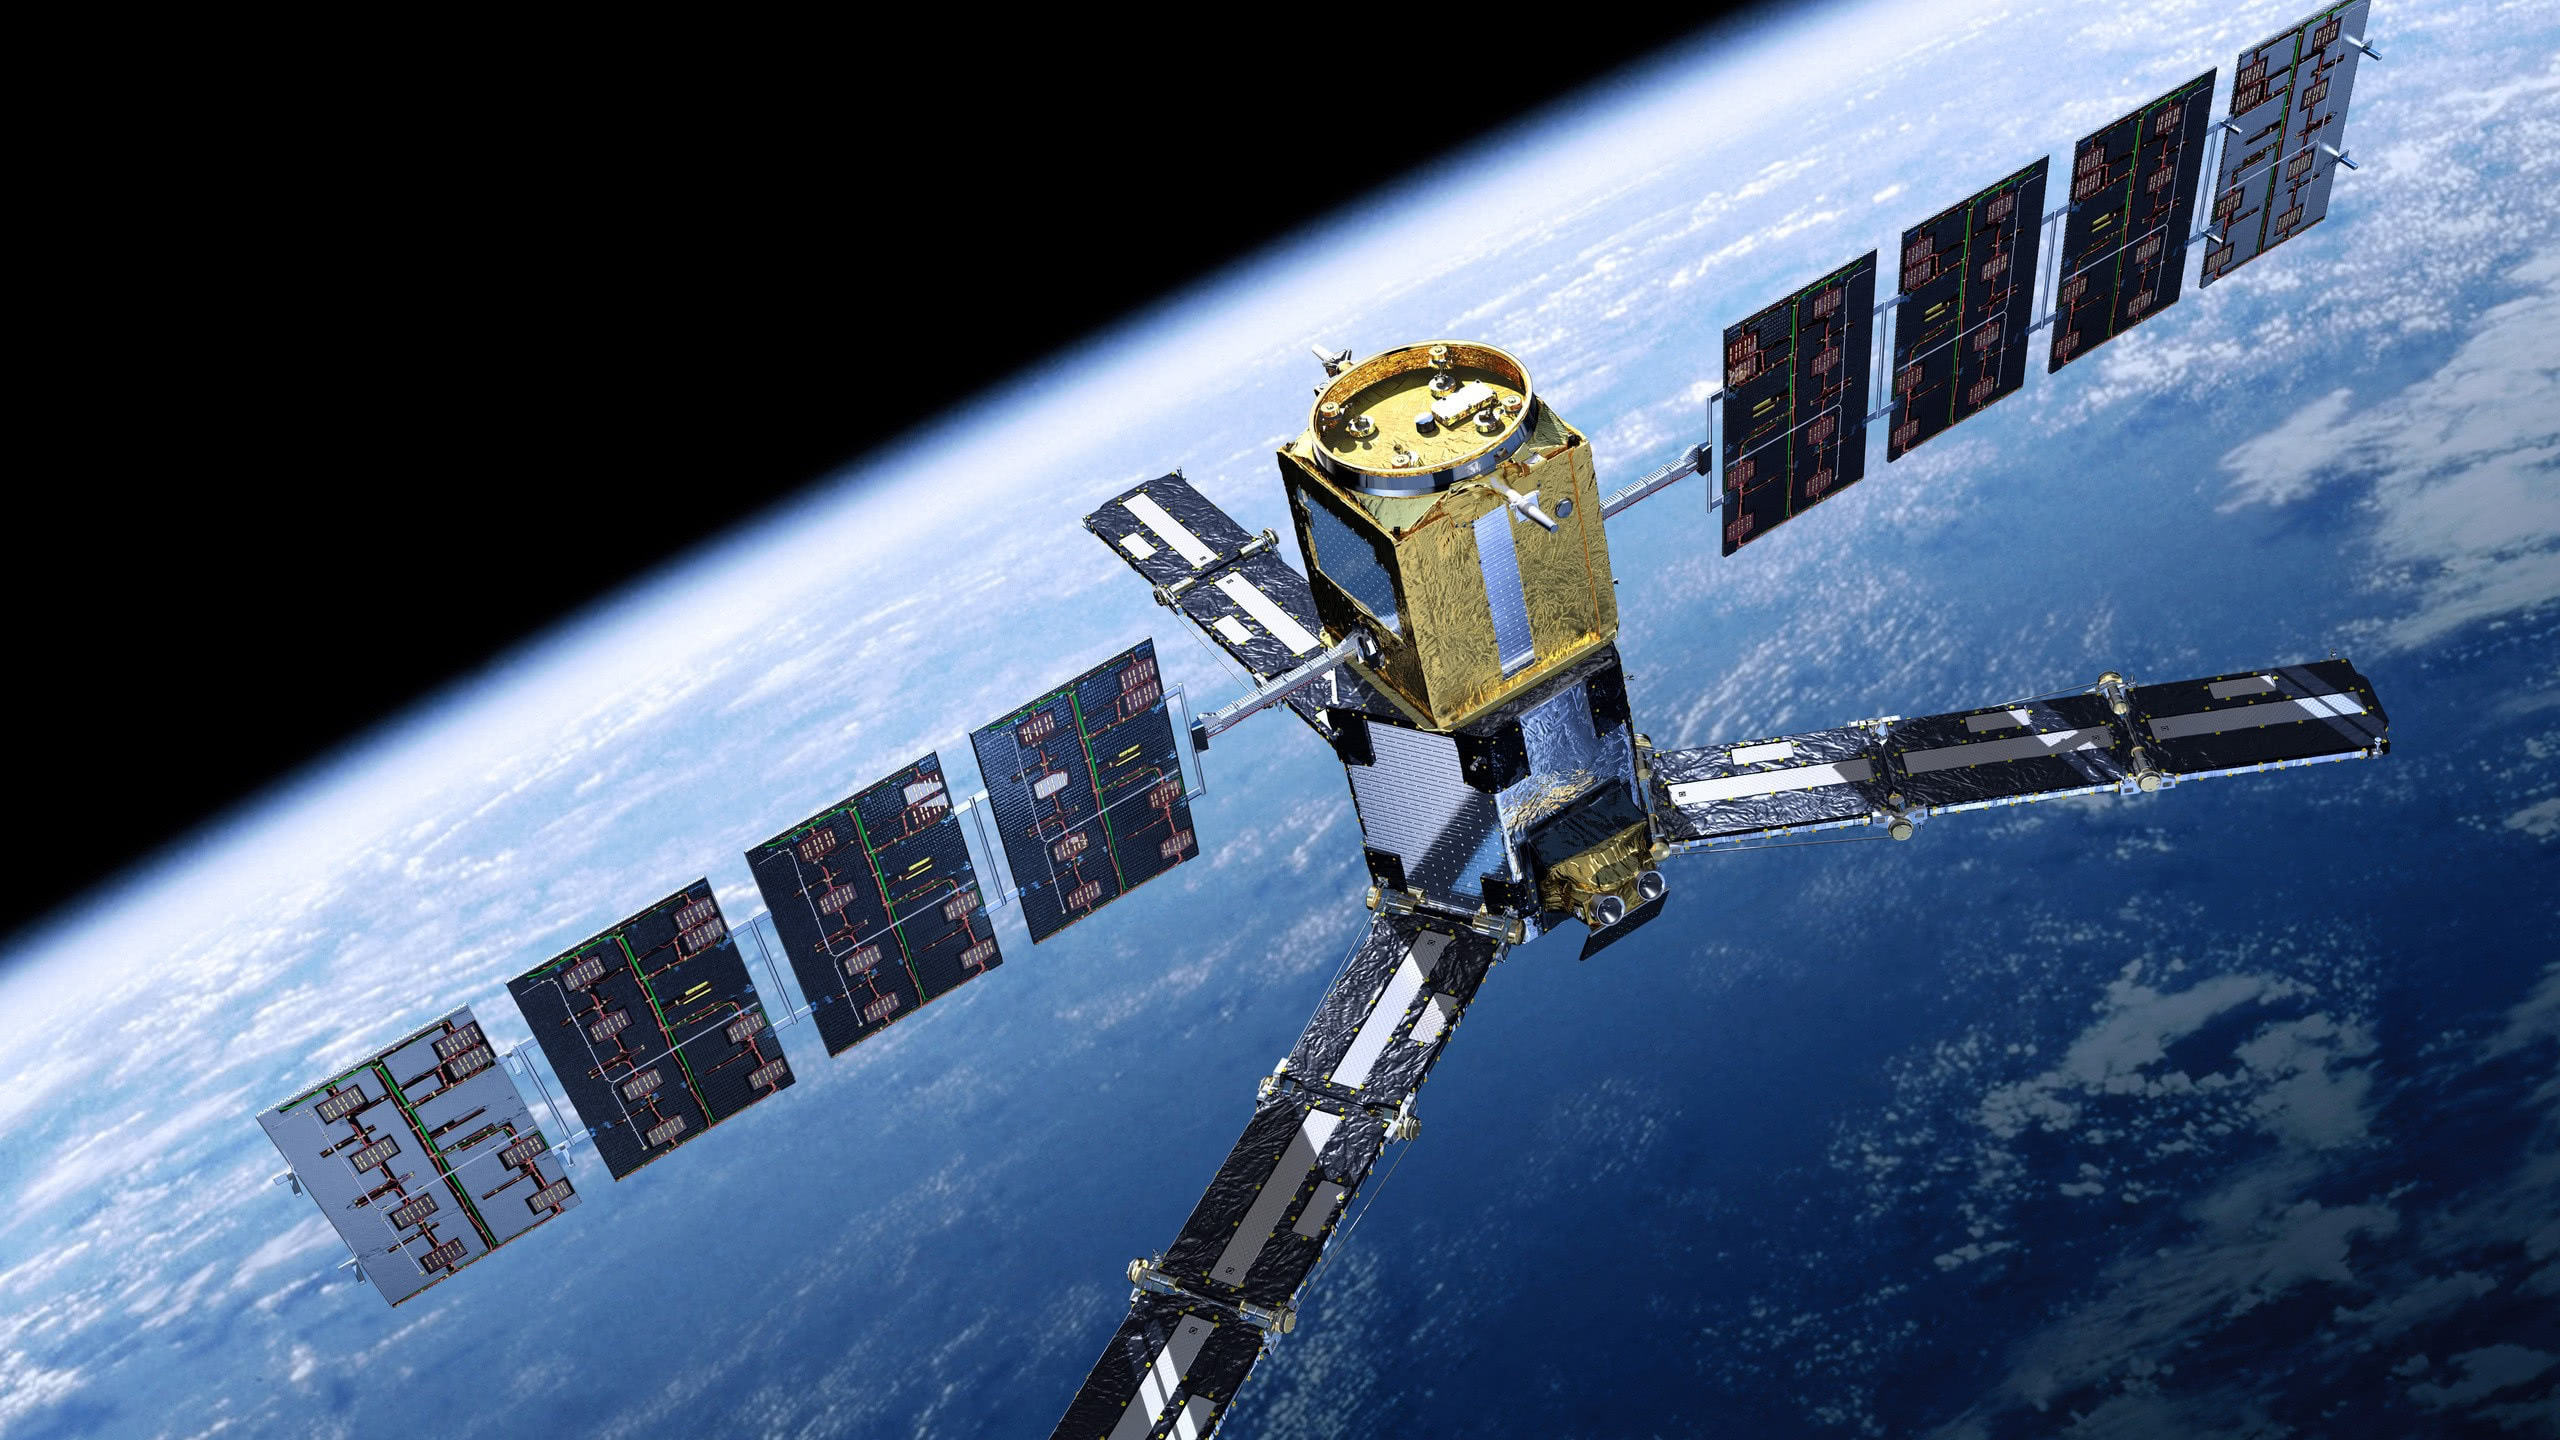 satellite wqhd 1440p wallpaper